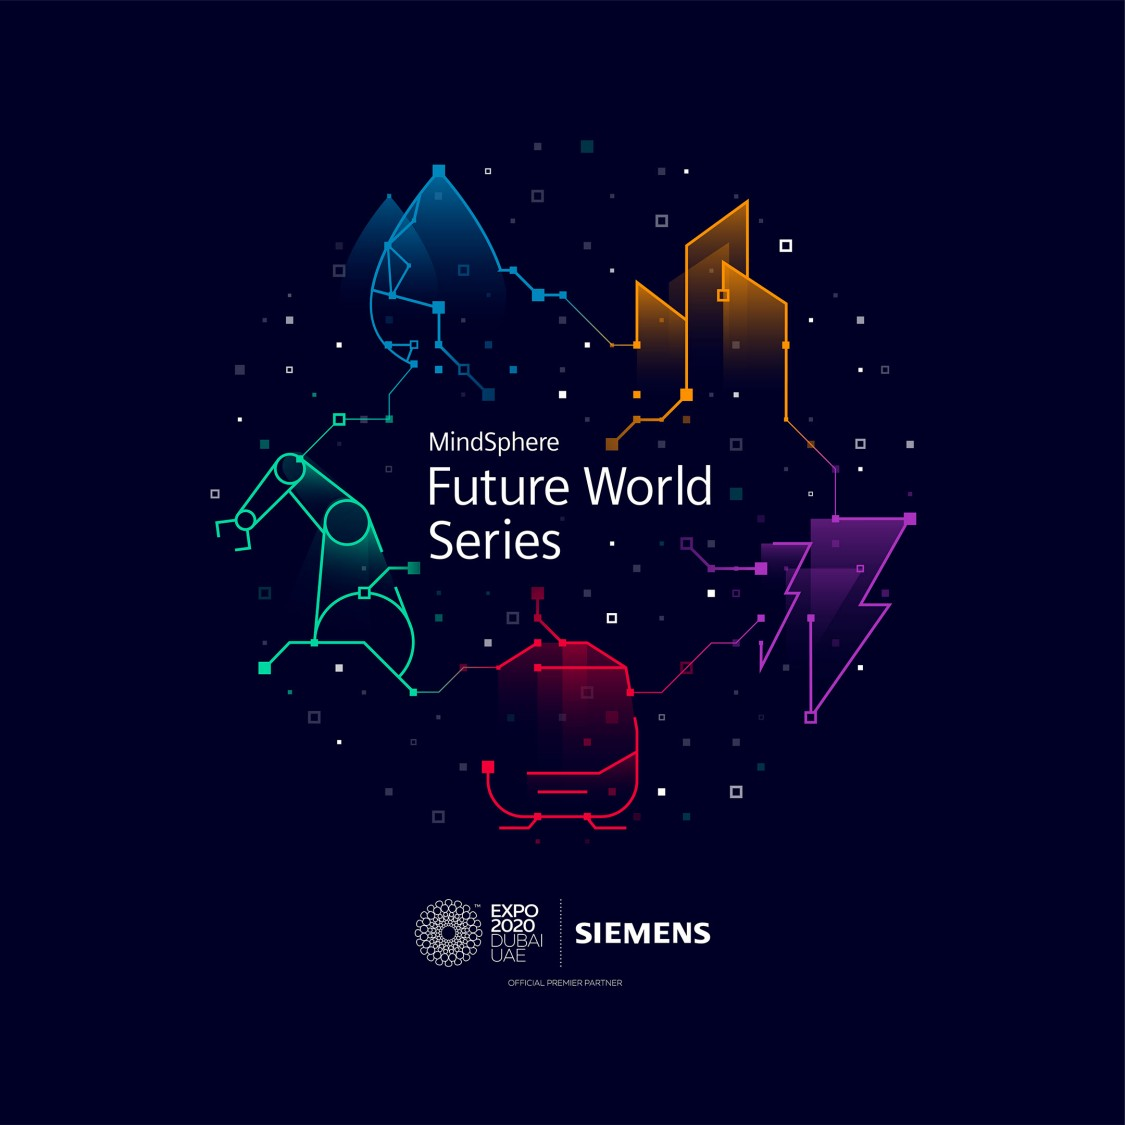 MindSphere Future World Series